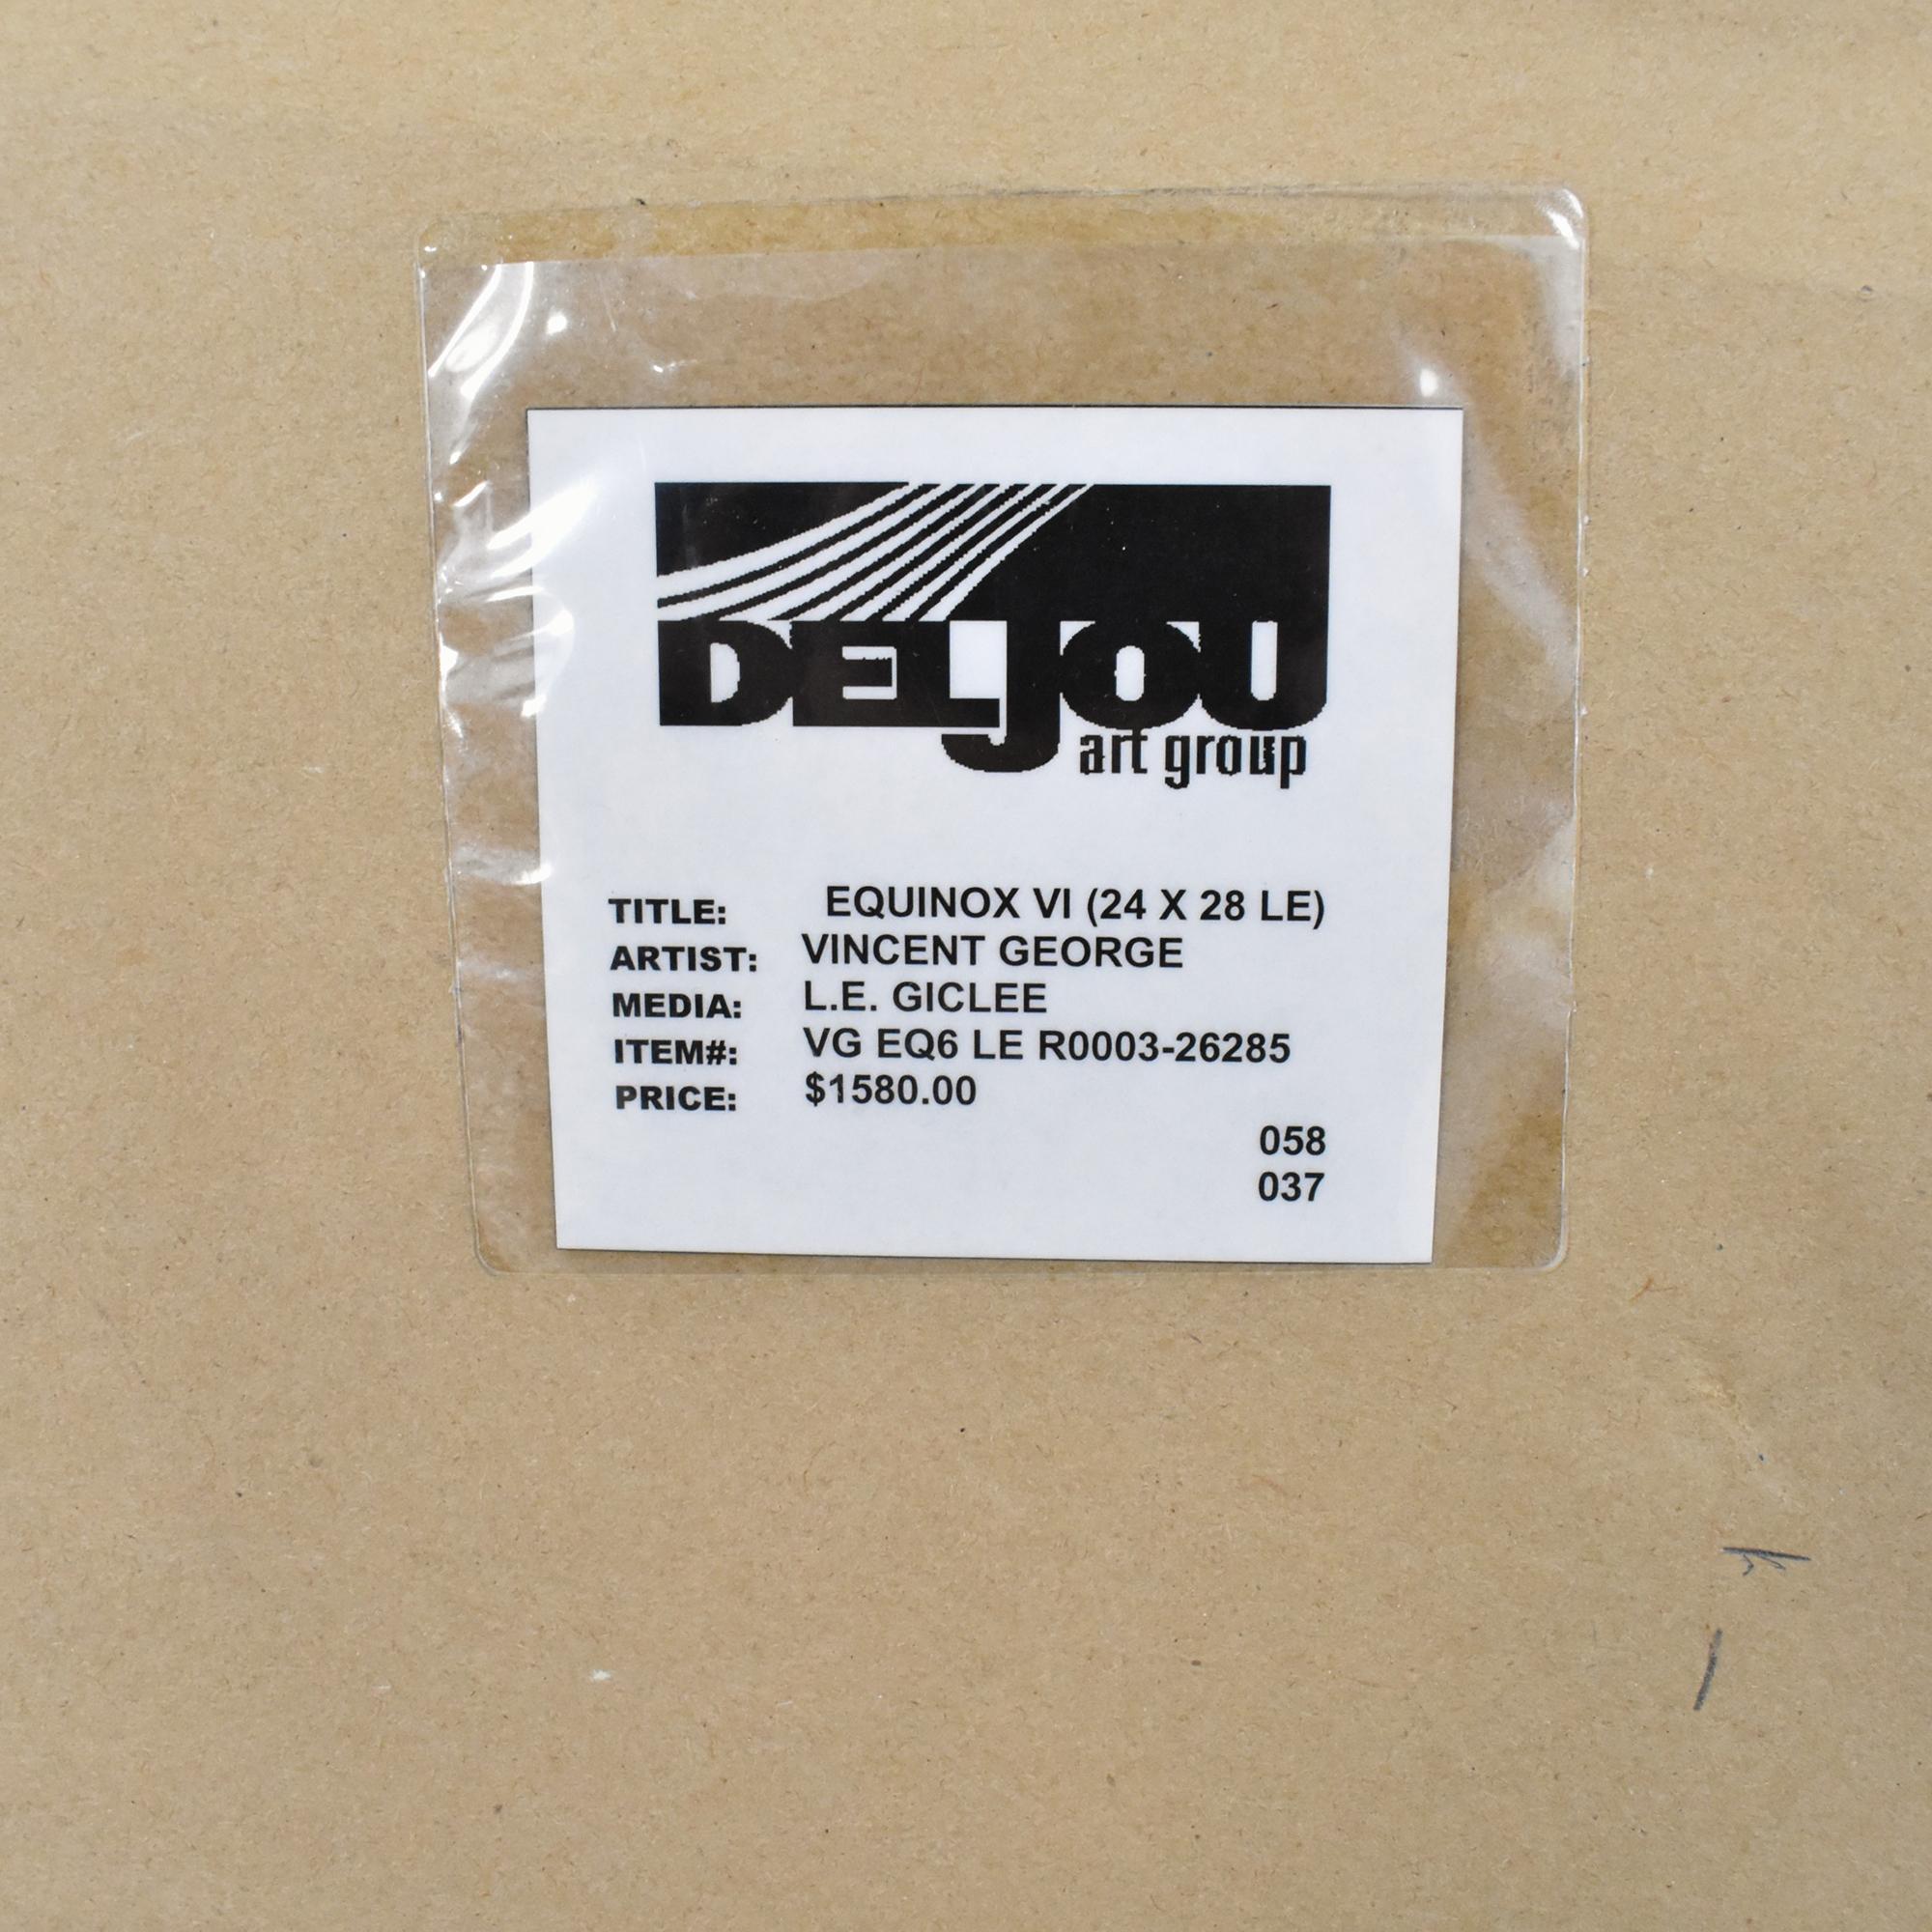 buy  Deljou Art Group Vincent George Equinox VI Framed Wall Art online